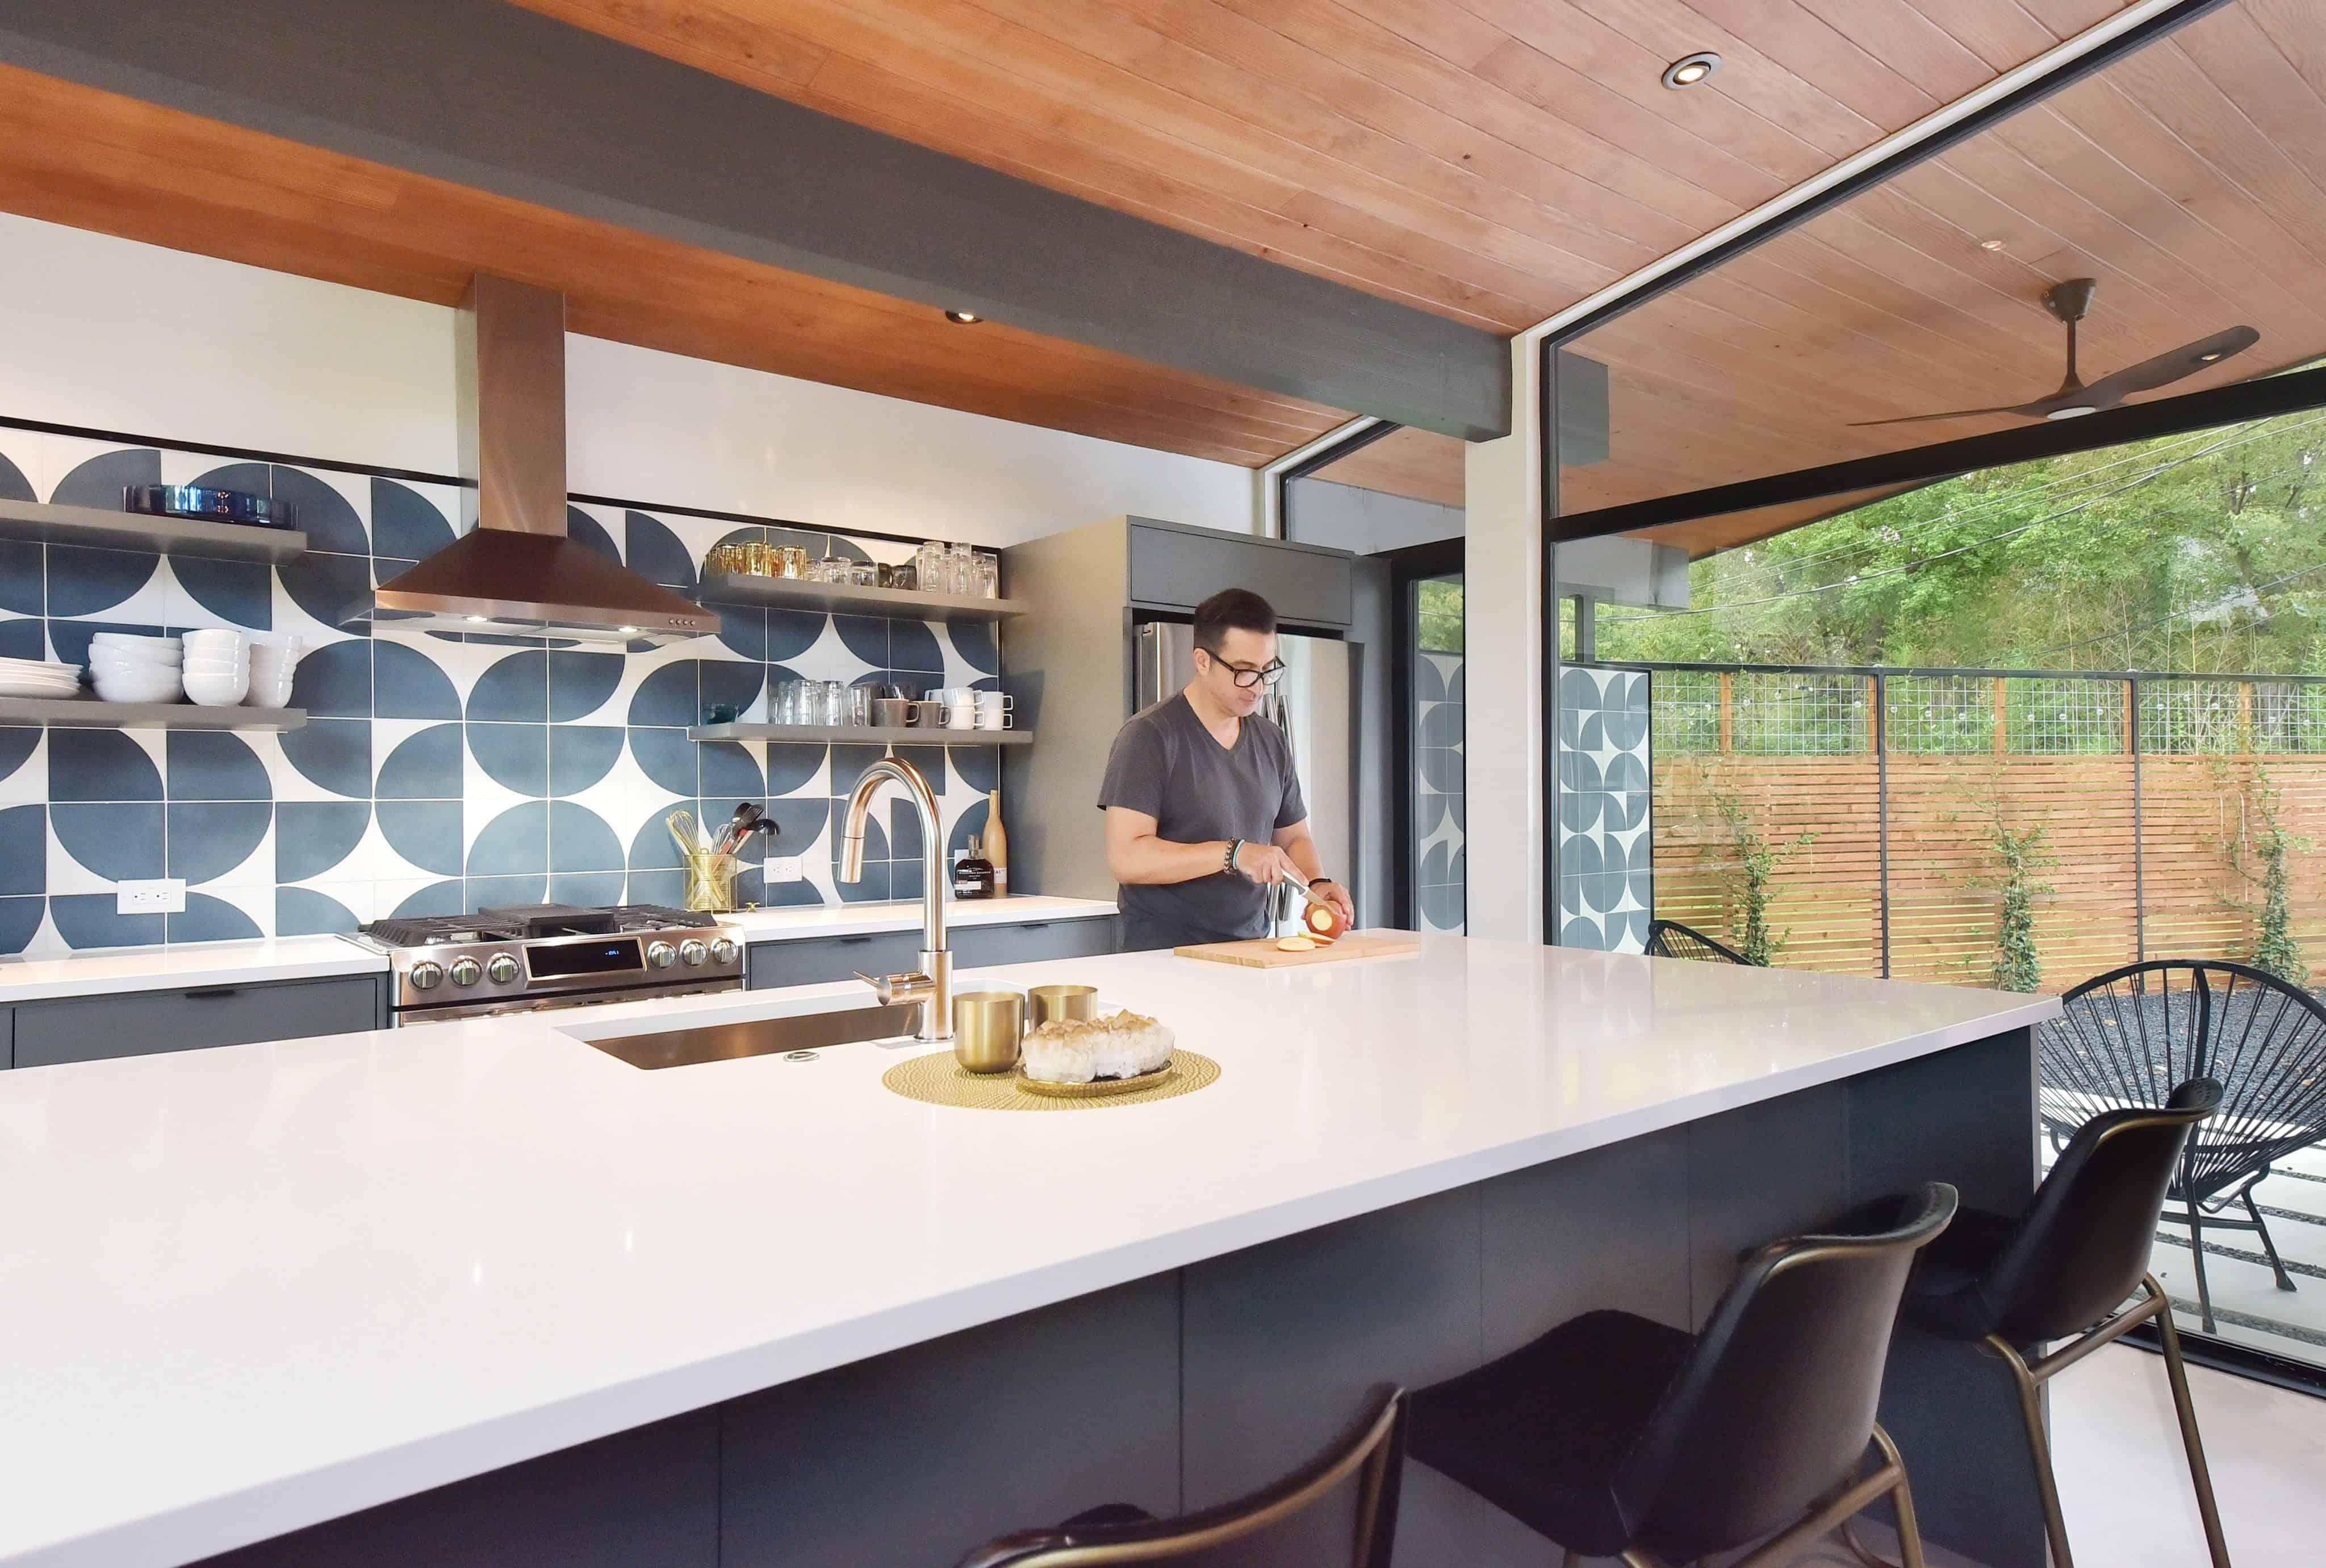 Kitchen in the Re-Open House designed by Matt Fajkus Architecture.